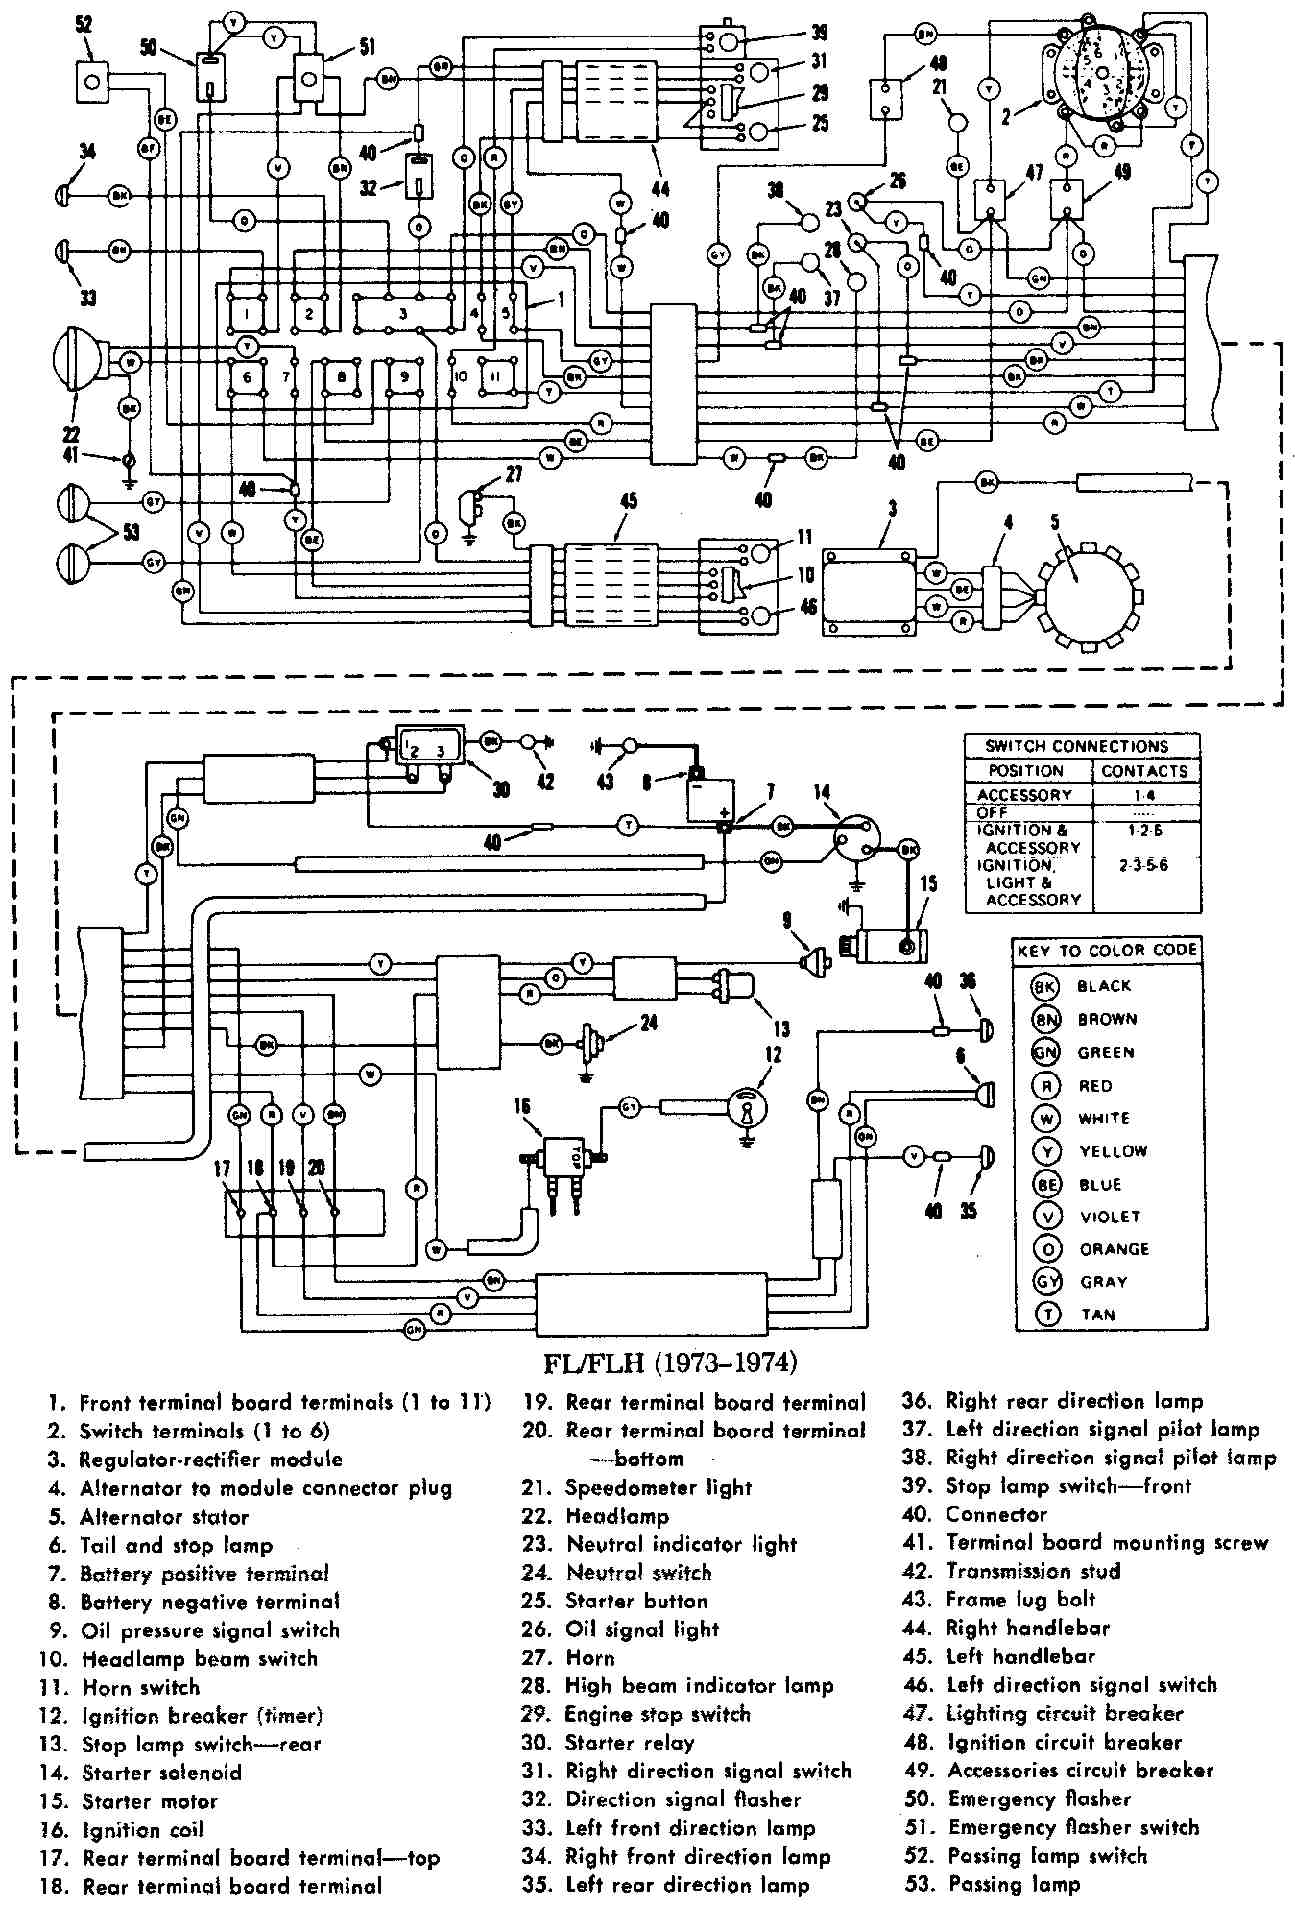 wiring diagram 2002 harley davidson flht wiring diagrams electrical 1972  harley-davidson golf cart wiring